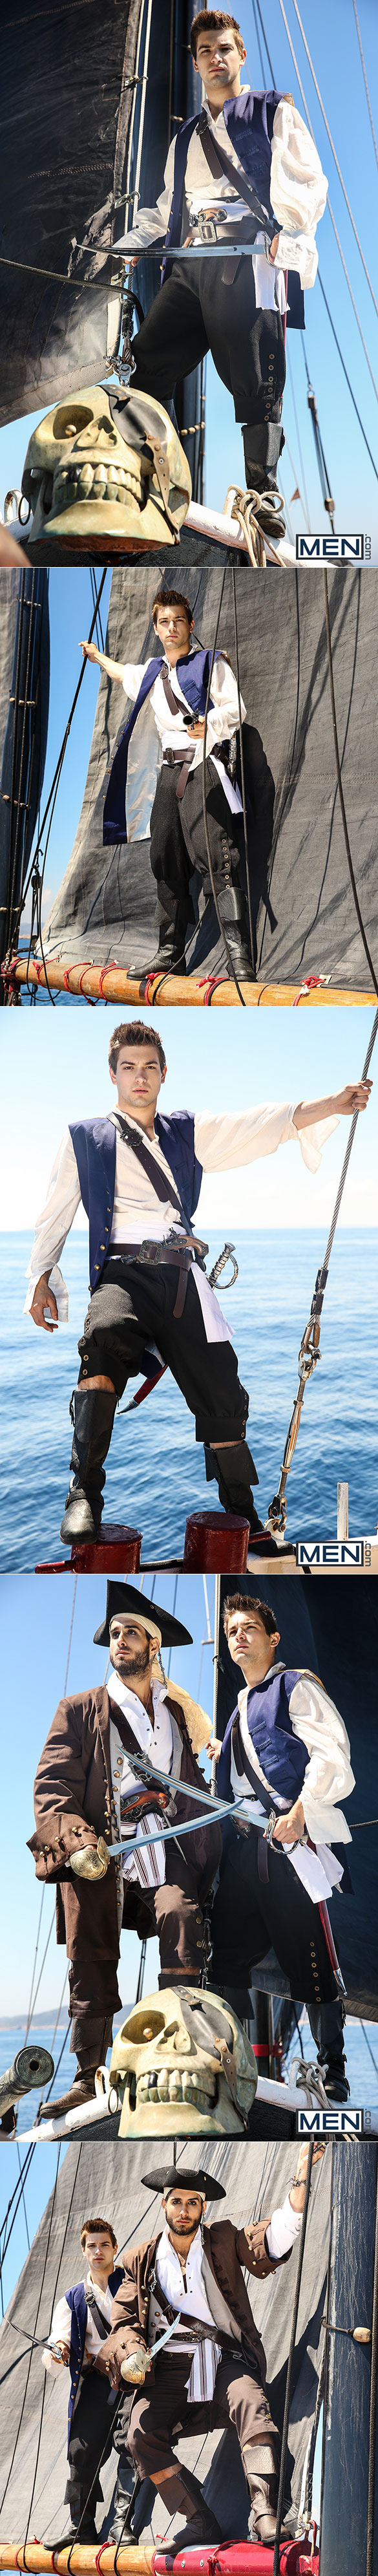 "Men.com: Diego Sans fucks Johnny Rapid in ""Pirates: A Gay XXX Parody, Part 1"""